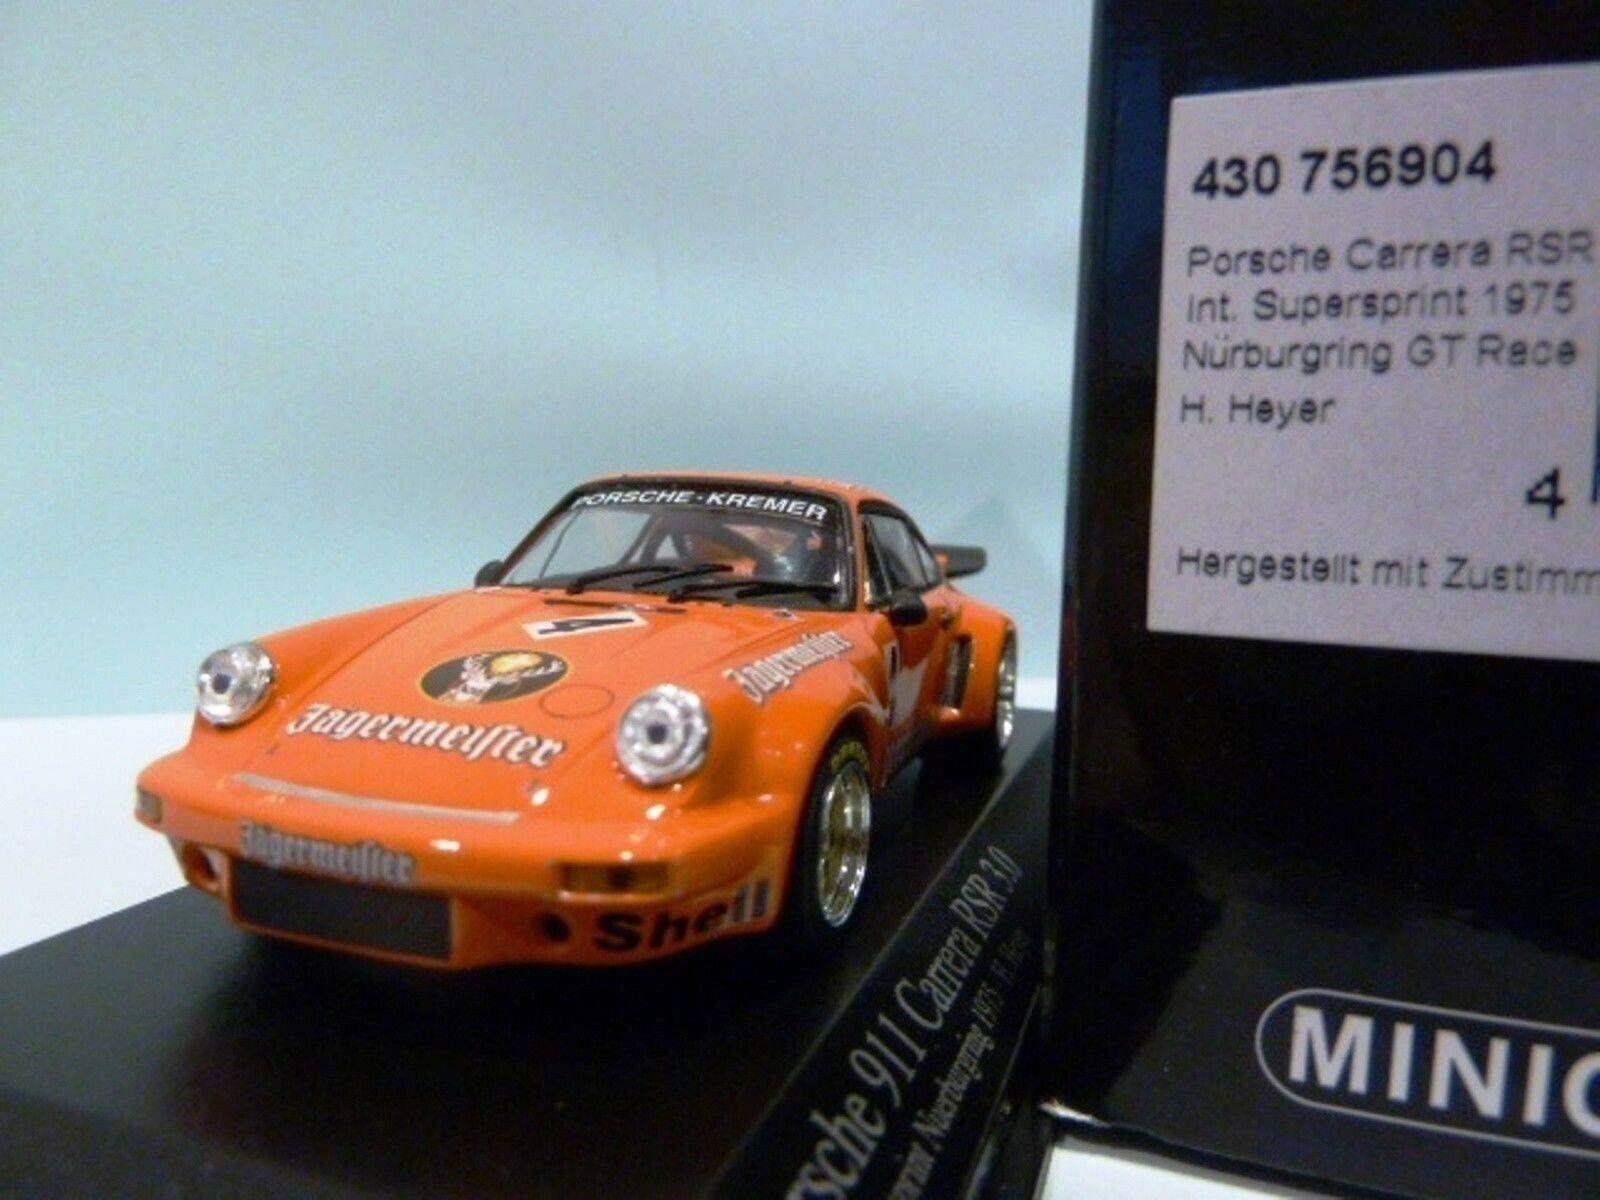 Wow extremadonnate raro Porsche 911 RSR 3.0 1975 Delantales 1 43 Minichamps-Spark